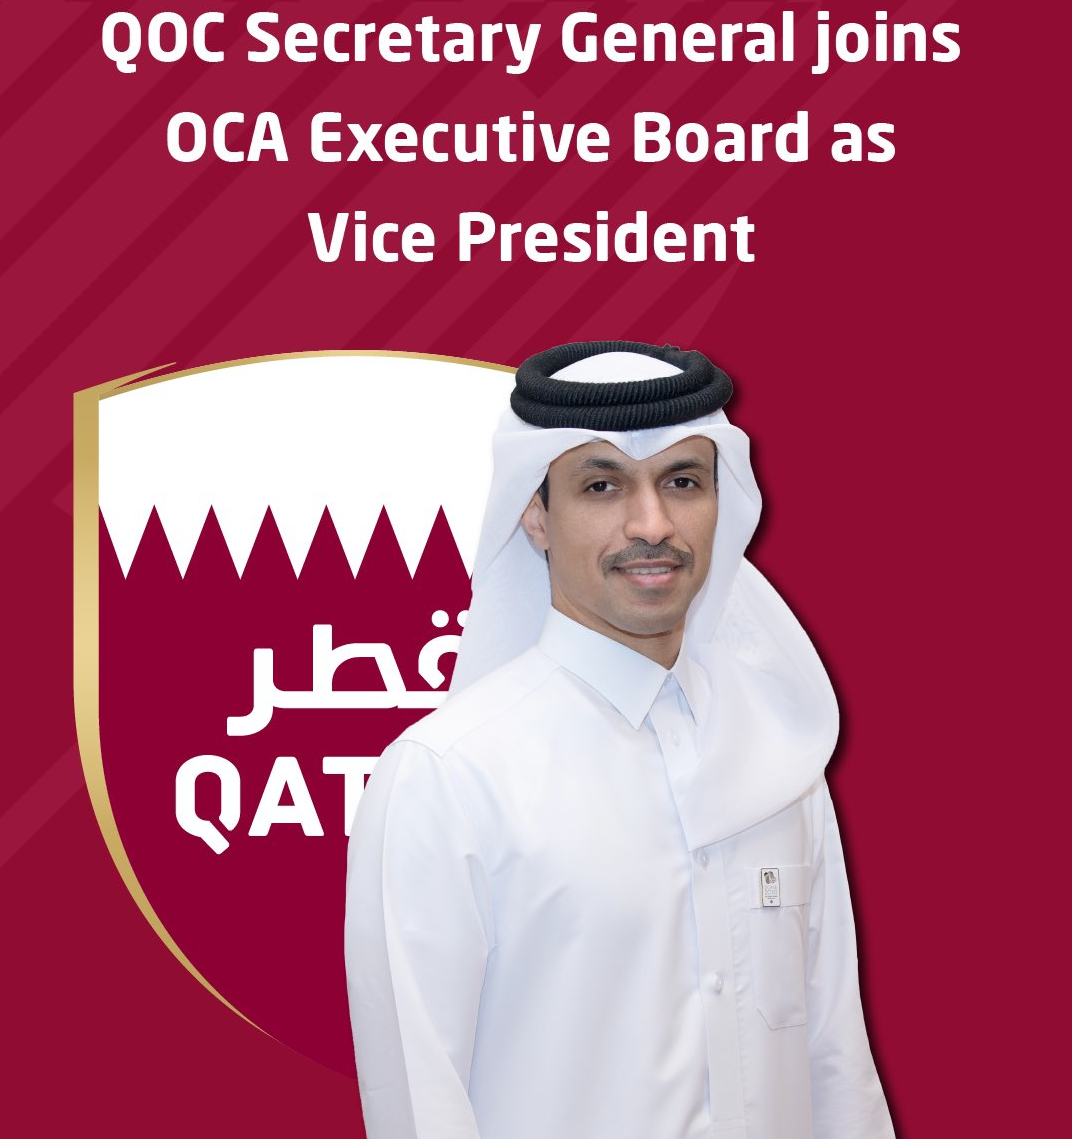 QOC secretary general joins OCA Executive Board after Doha awarded 2030 Asian Games